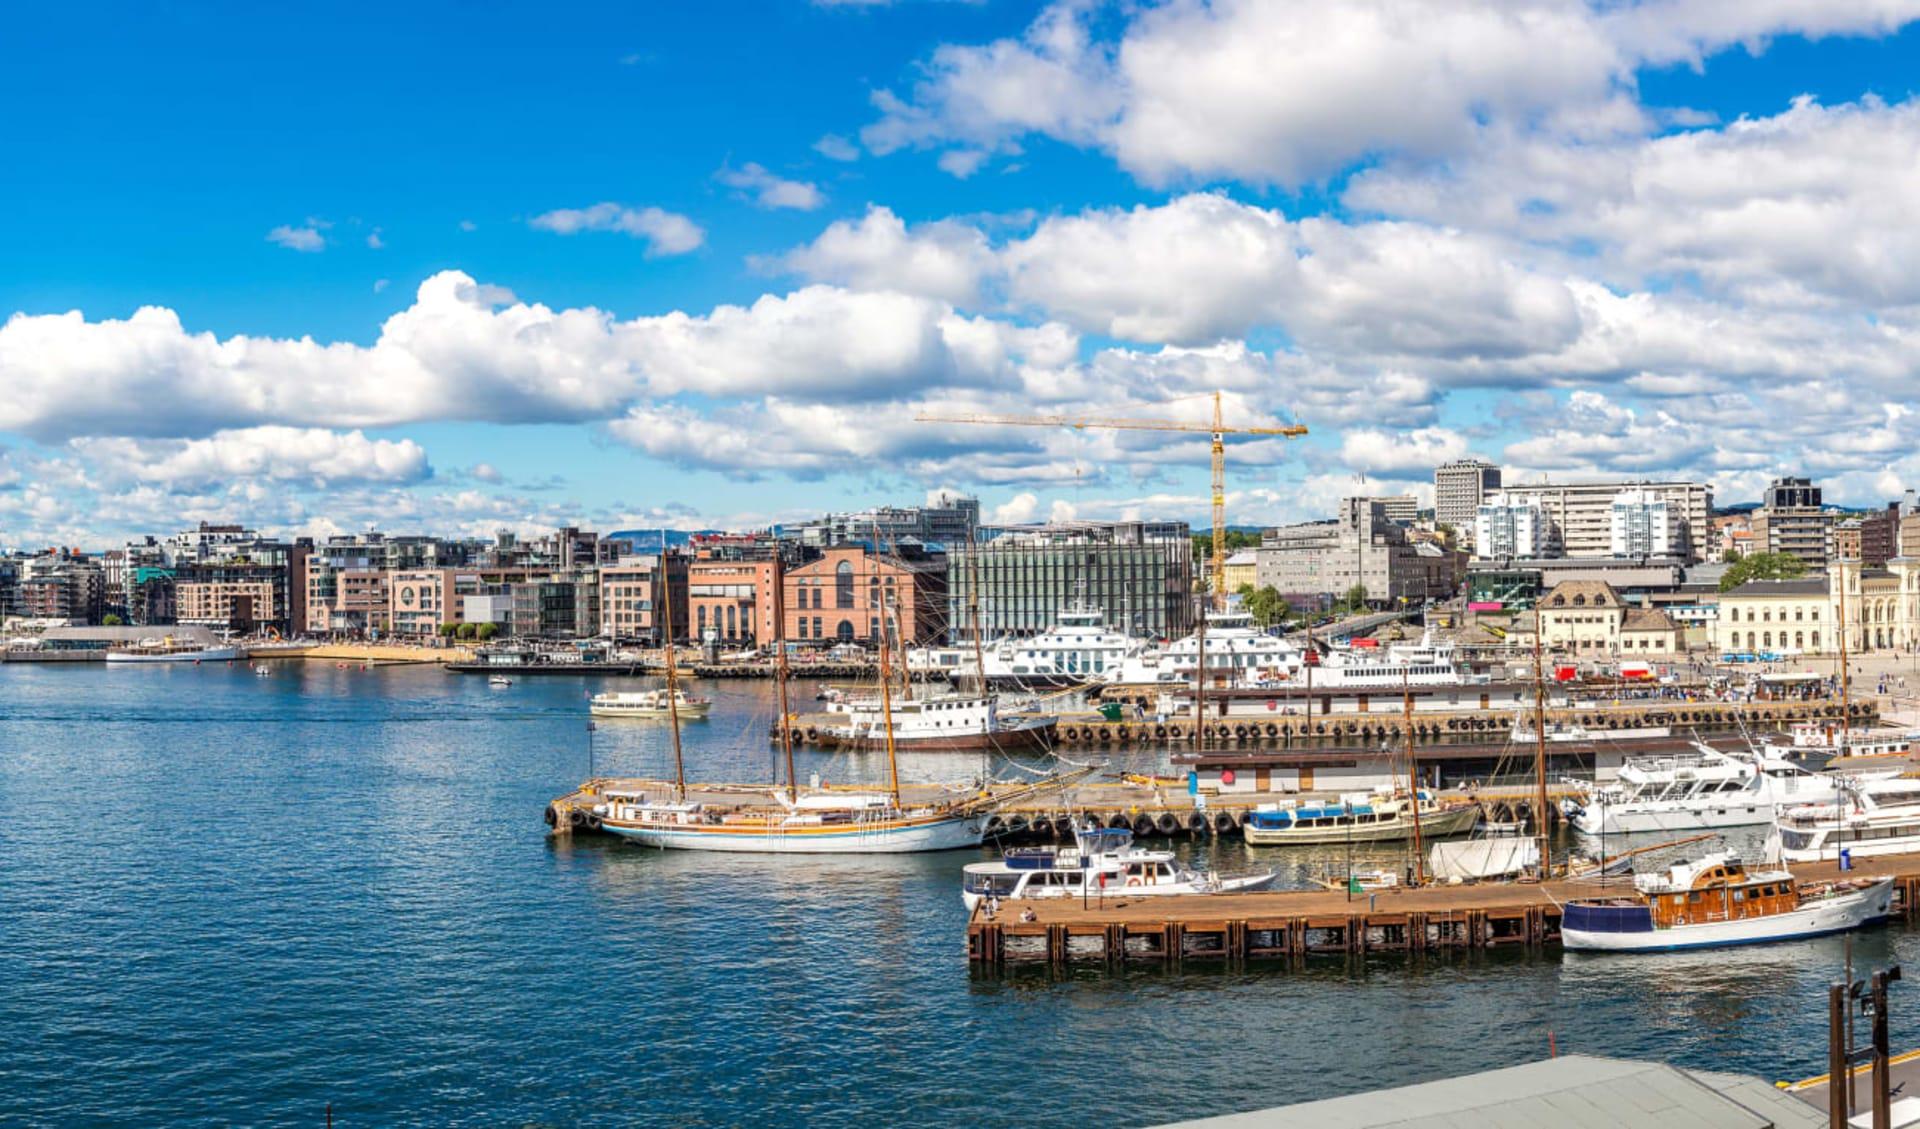 Comfort Grand Central in Oslo: Der Oslo-Norwegen-Hafen